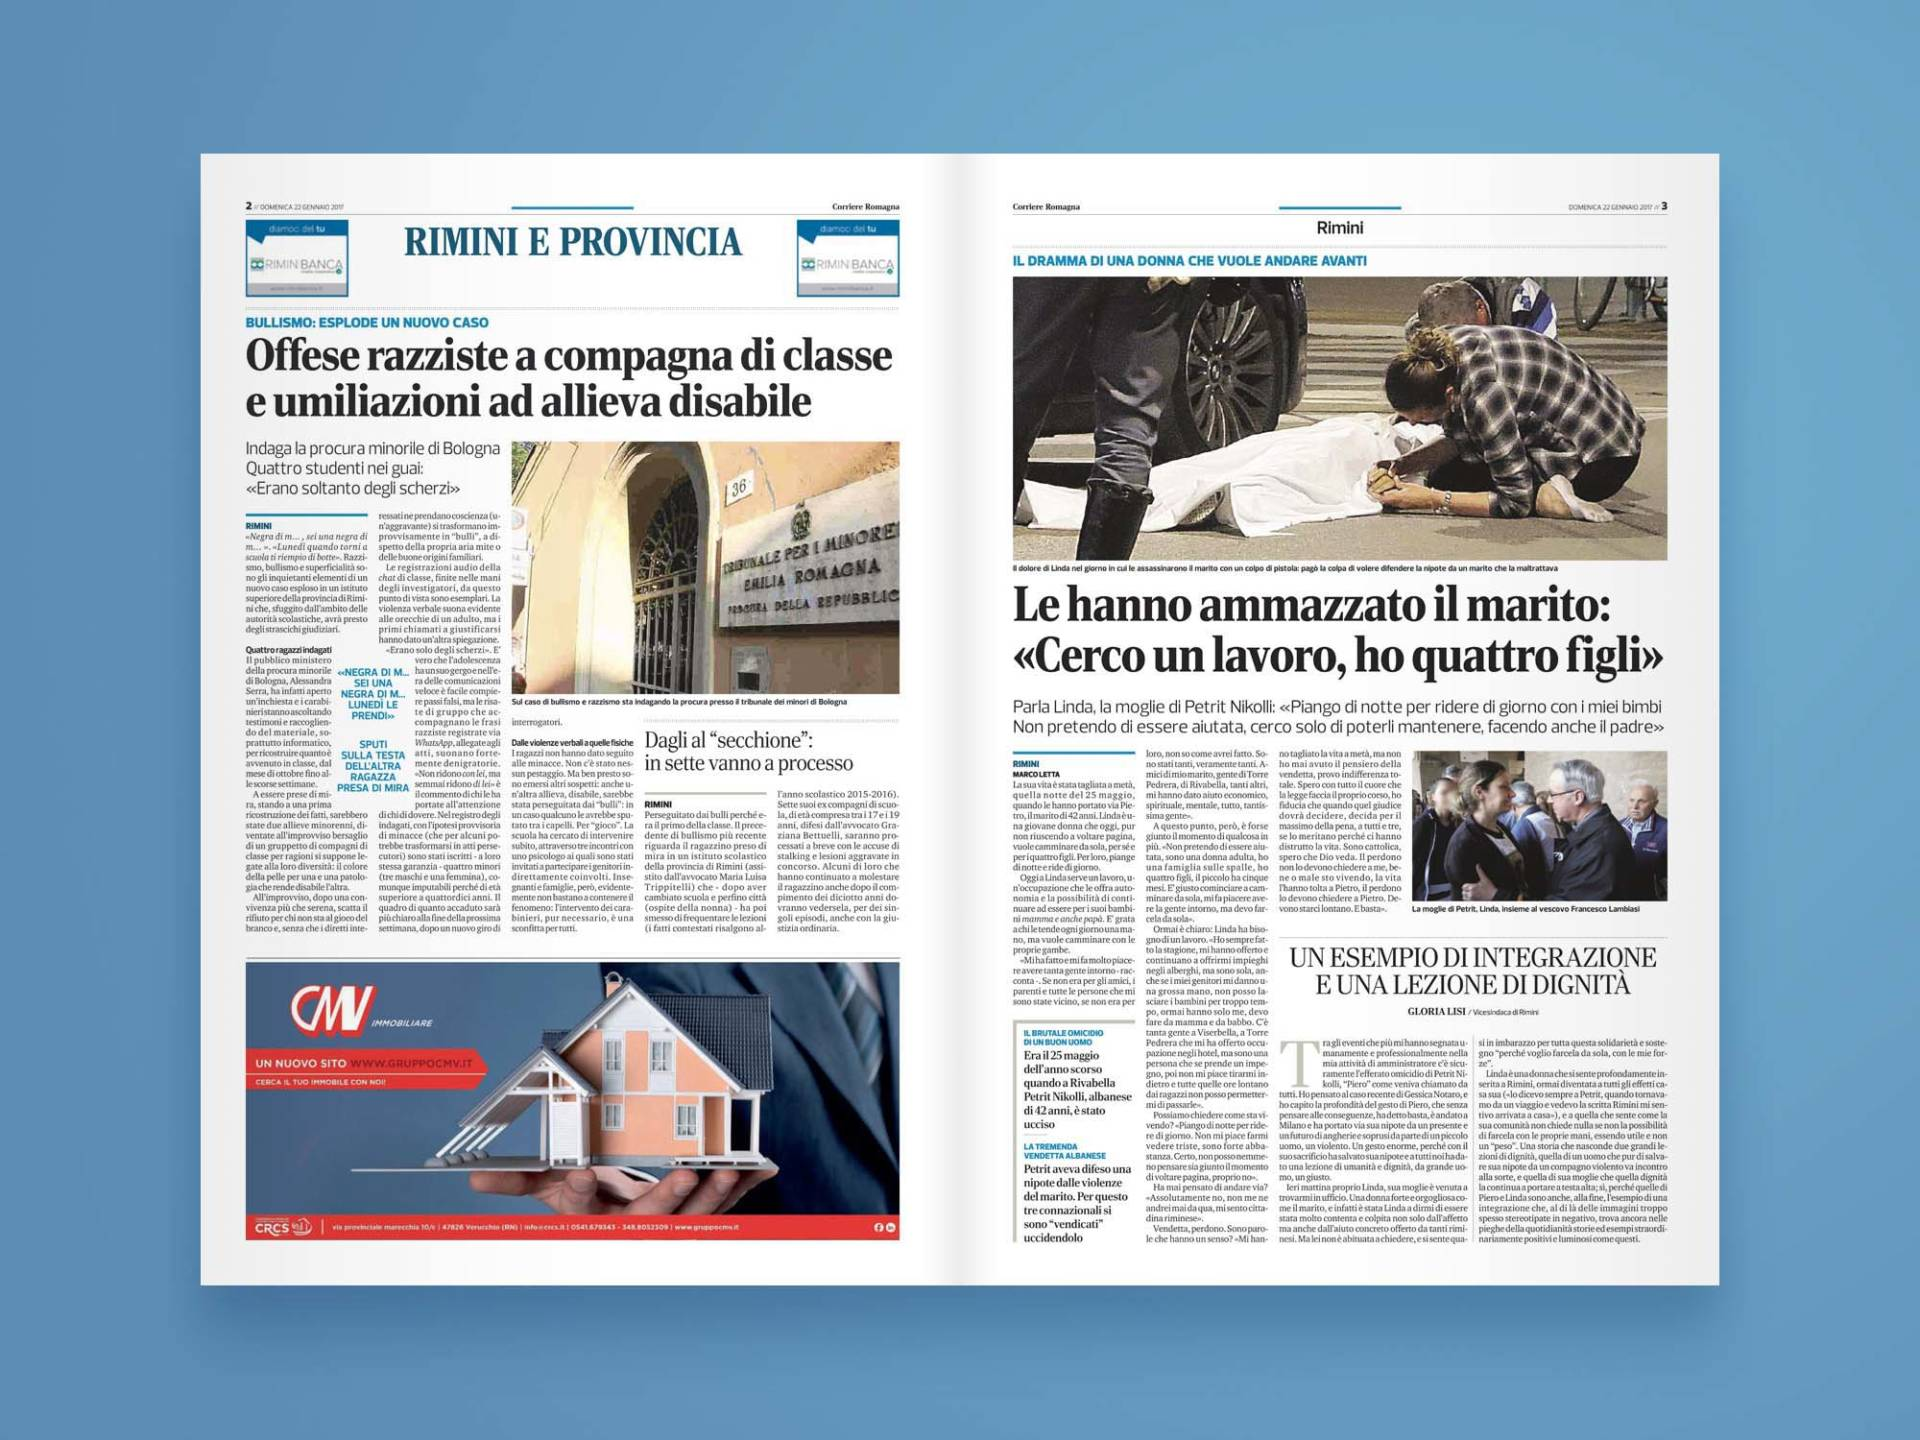 Corriere_Romagna_05_Wenceslau_News_Design